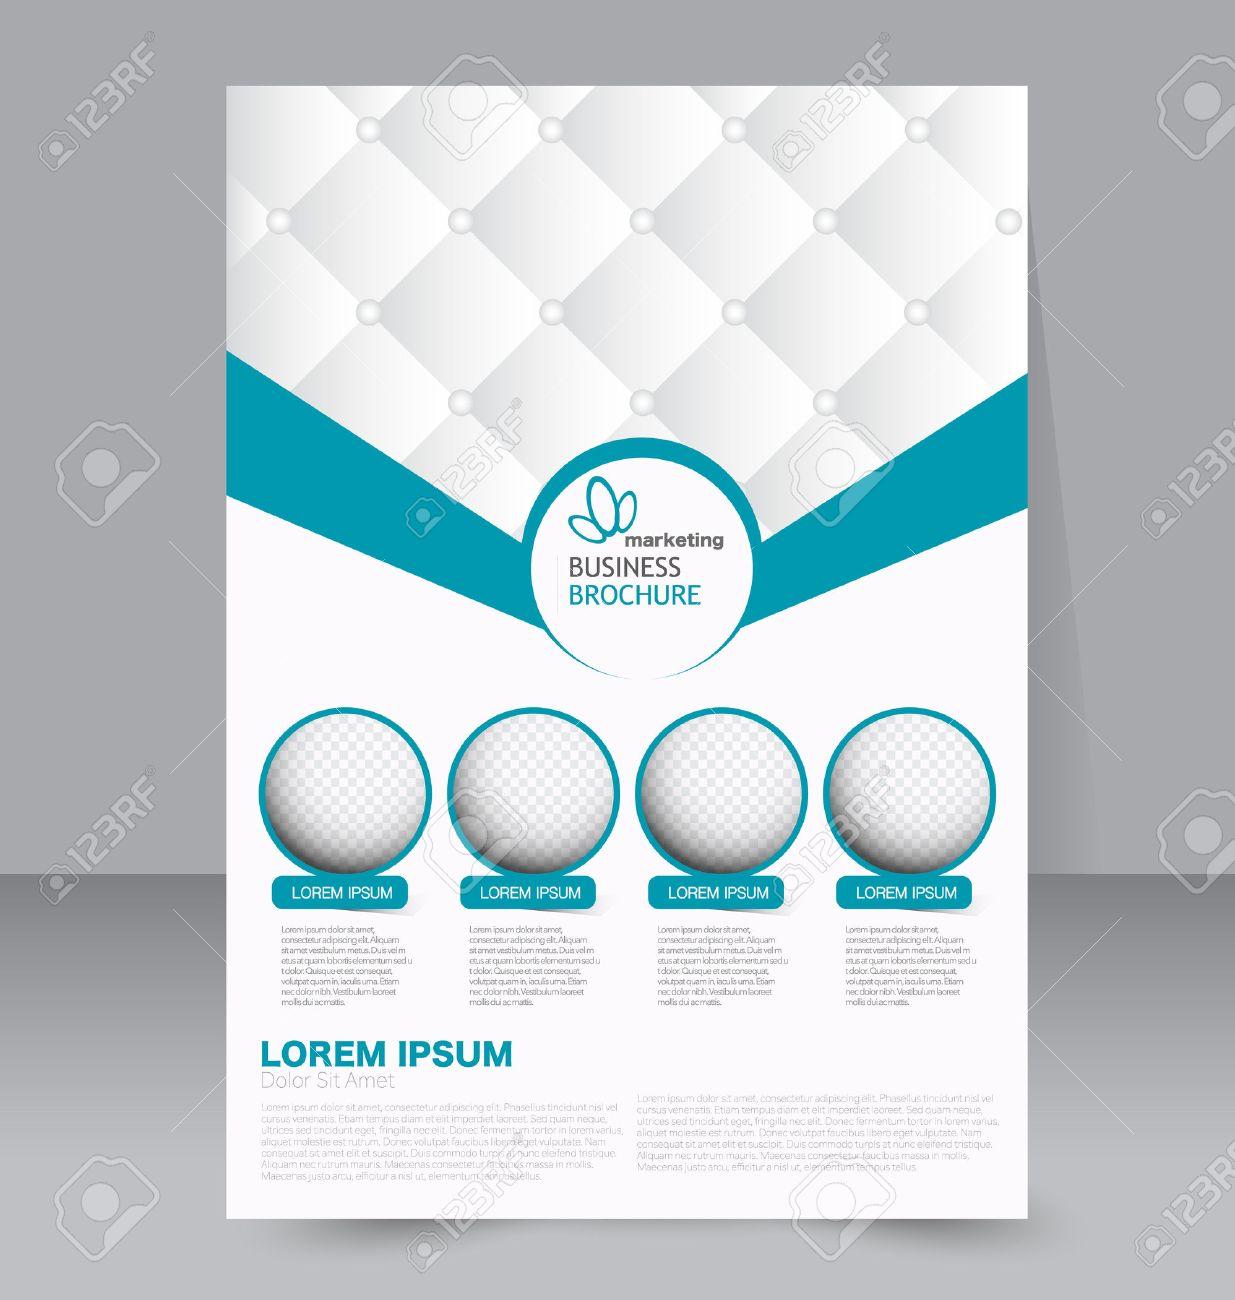 Flyer template. Business brochure. Editable A4 poster for design, education, presentation, website, magazine cover. Blue color. - 51526133